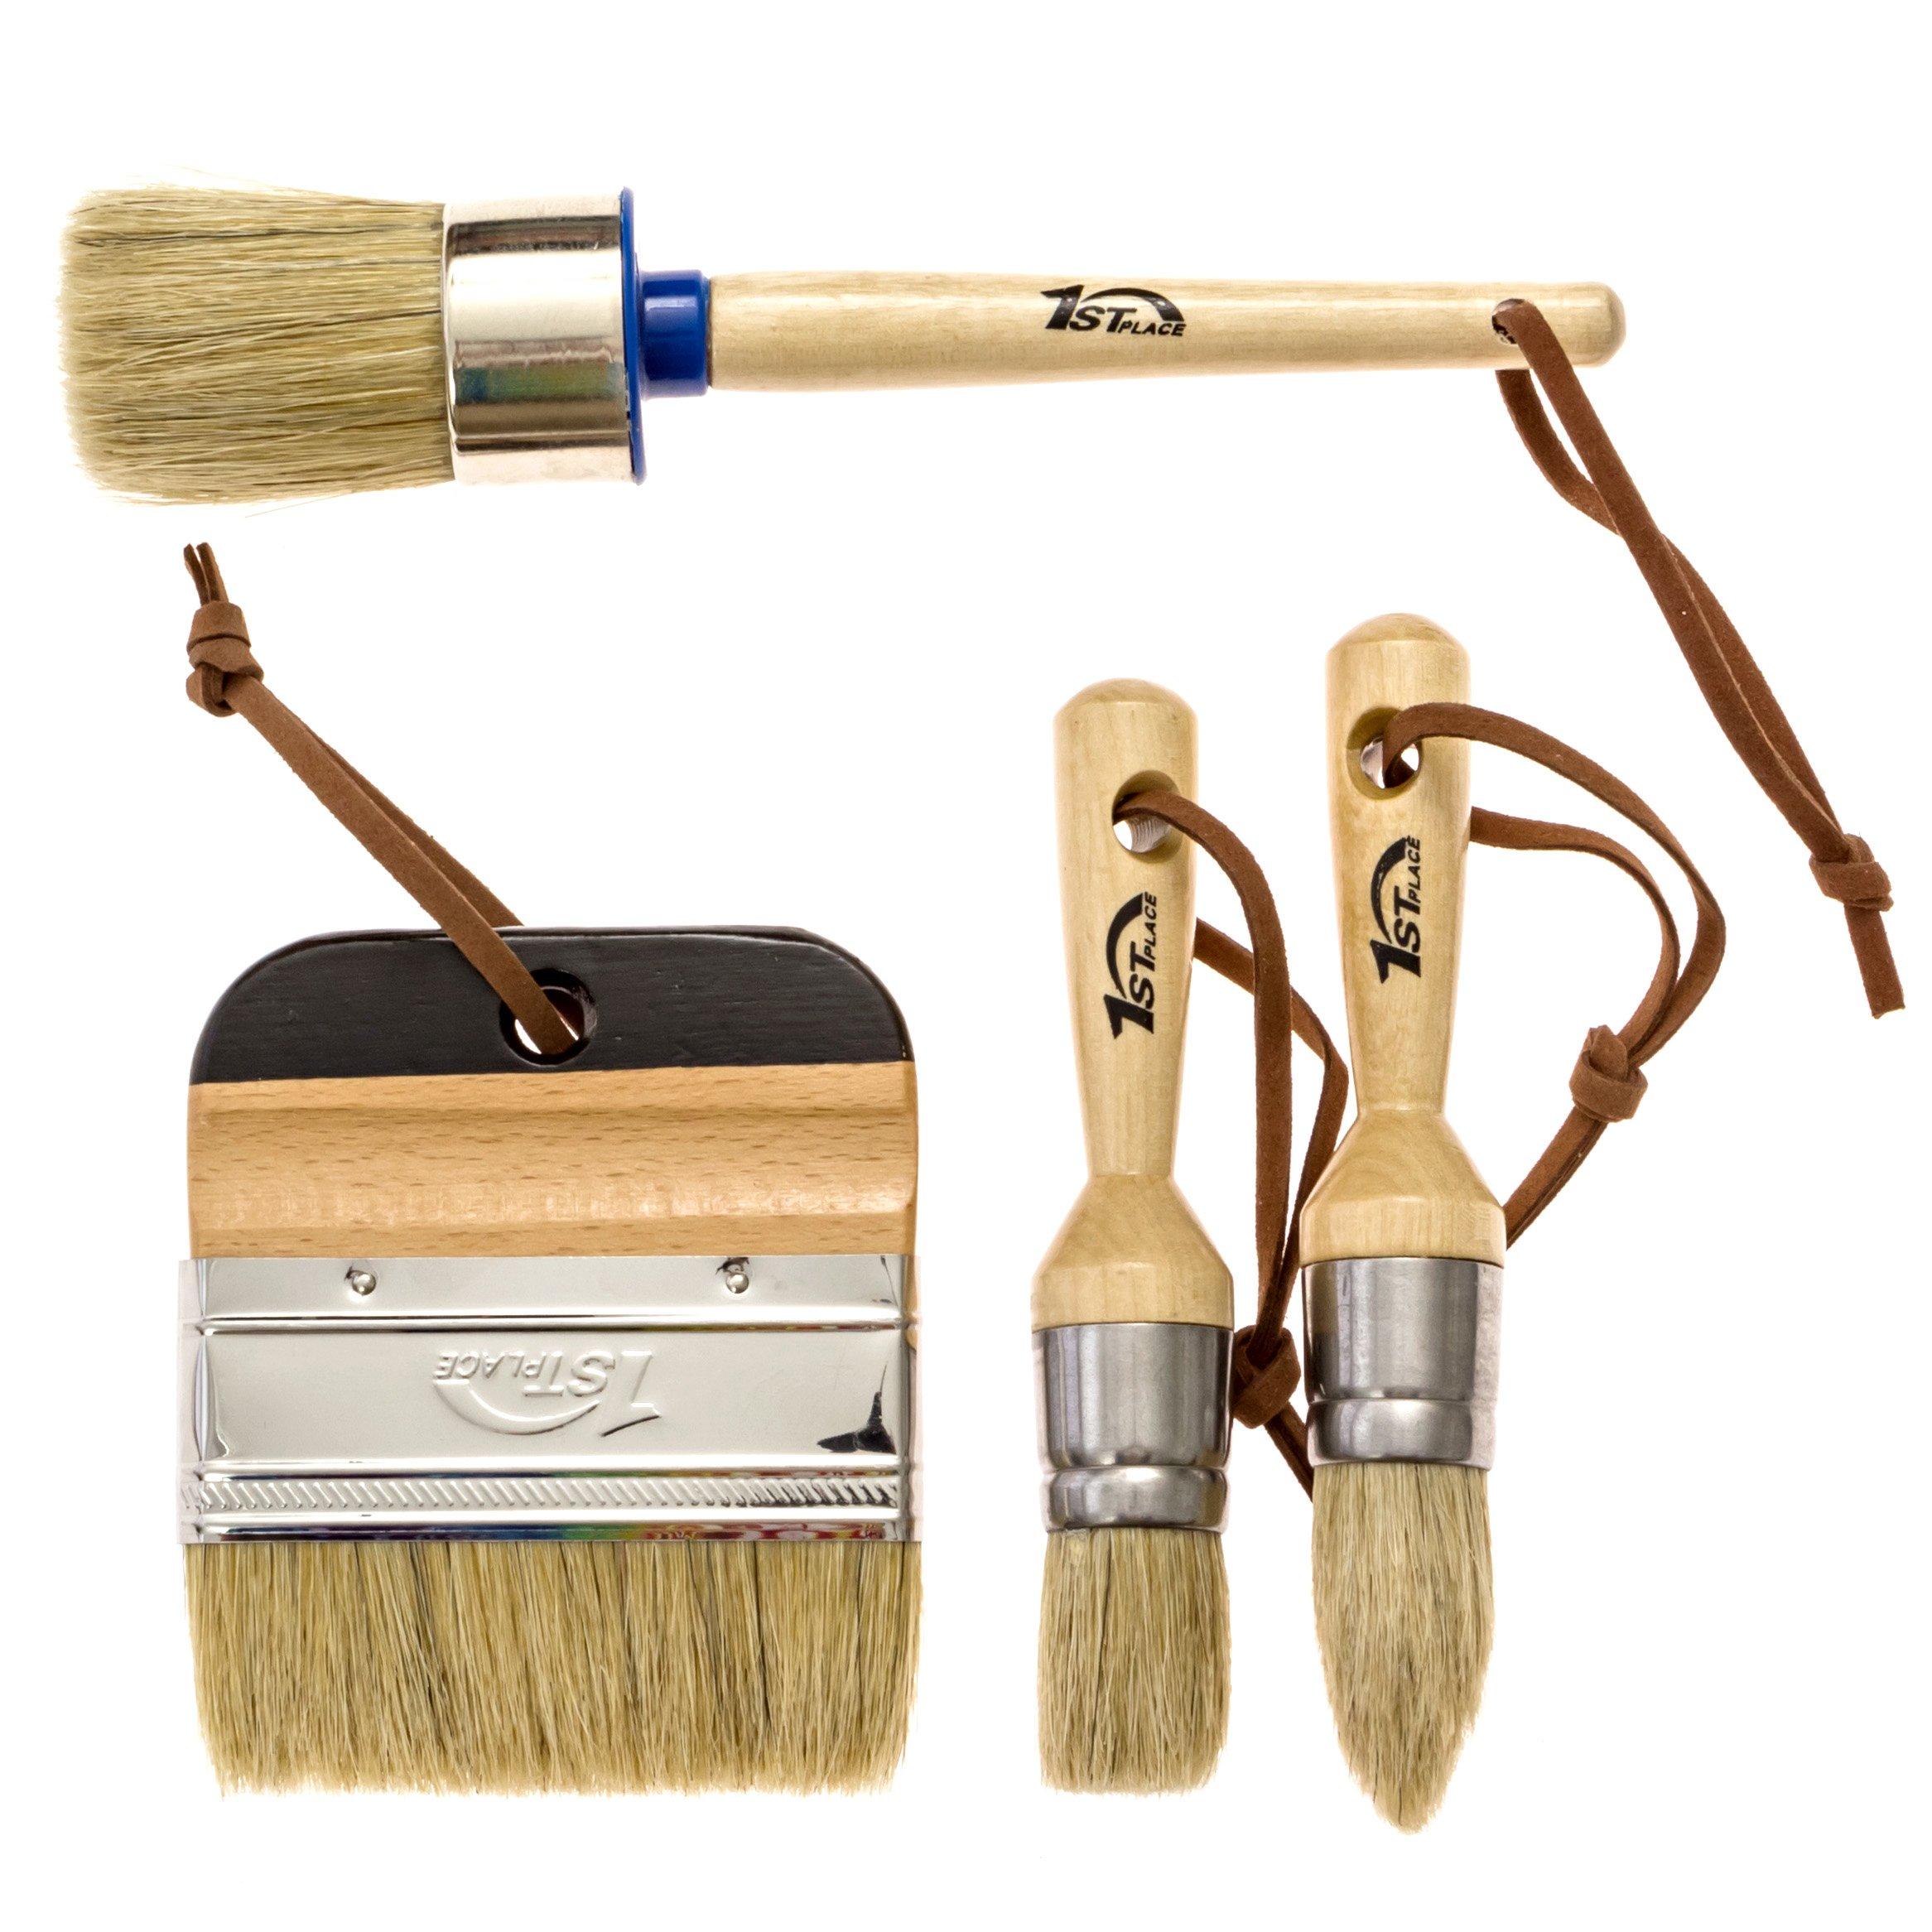 1st Place Ultra Chalk Paint & Wax 4 Piece Natural Bristle Brush Set - Annie Sloan Quality